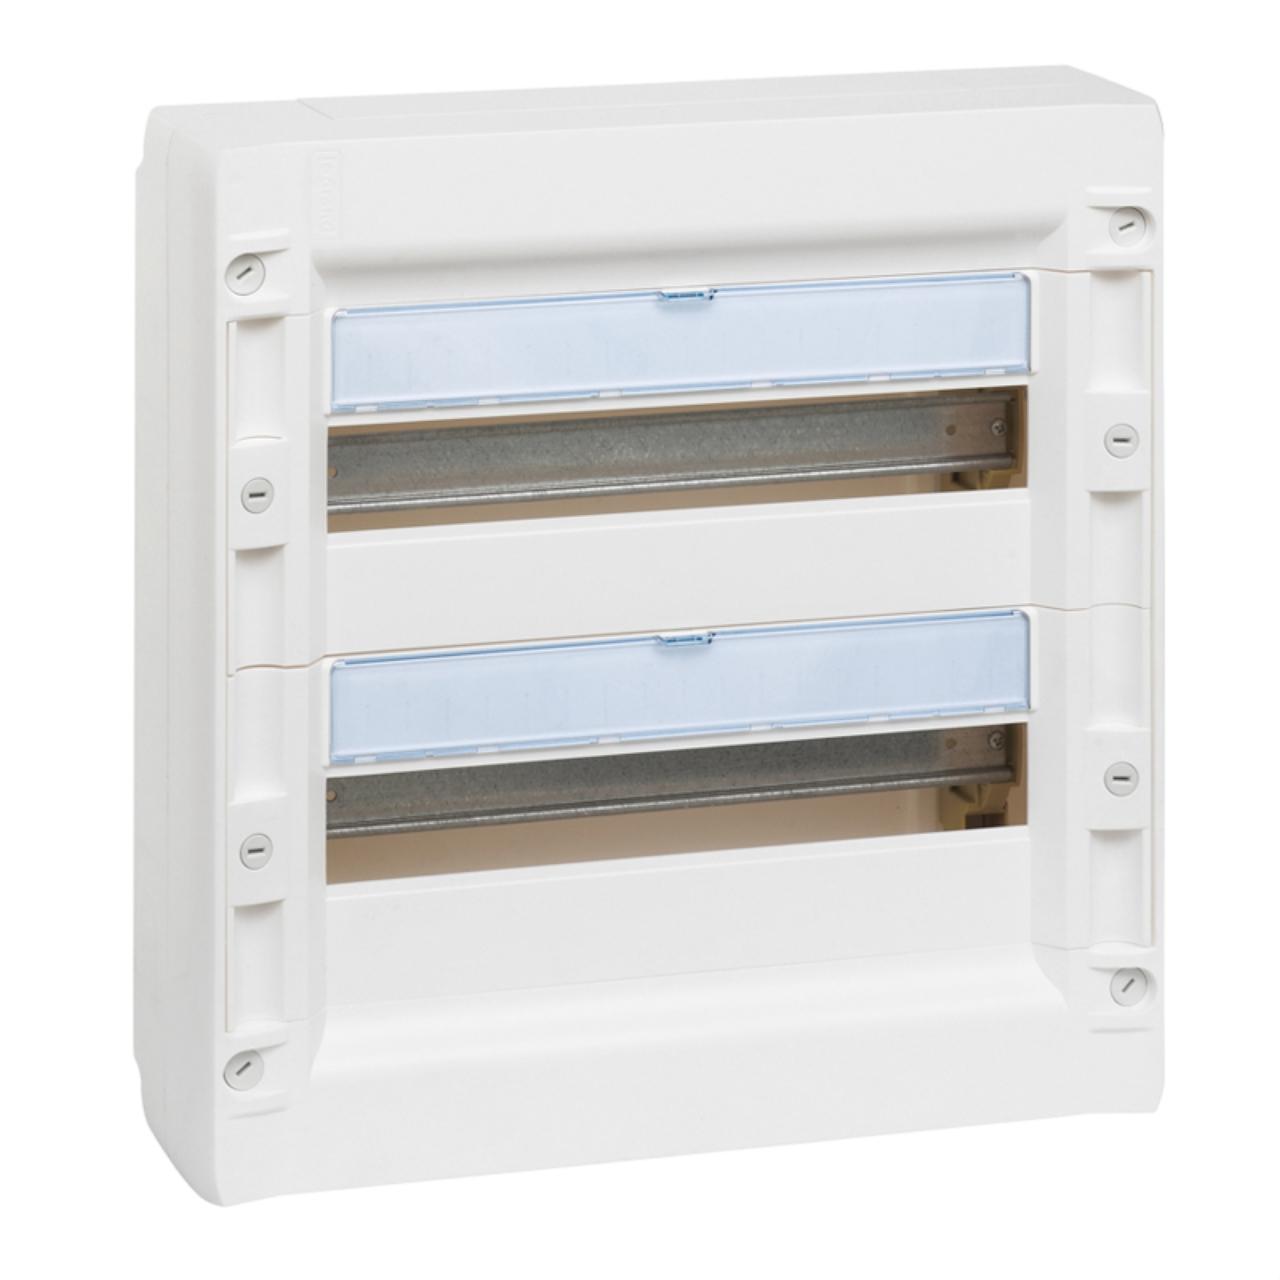 coffret legrand xl 125 2 x 18 modules poser en saillie. Black Bedroom Furniture Sets. Home Design Ideas